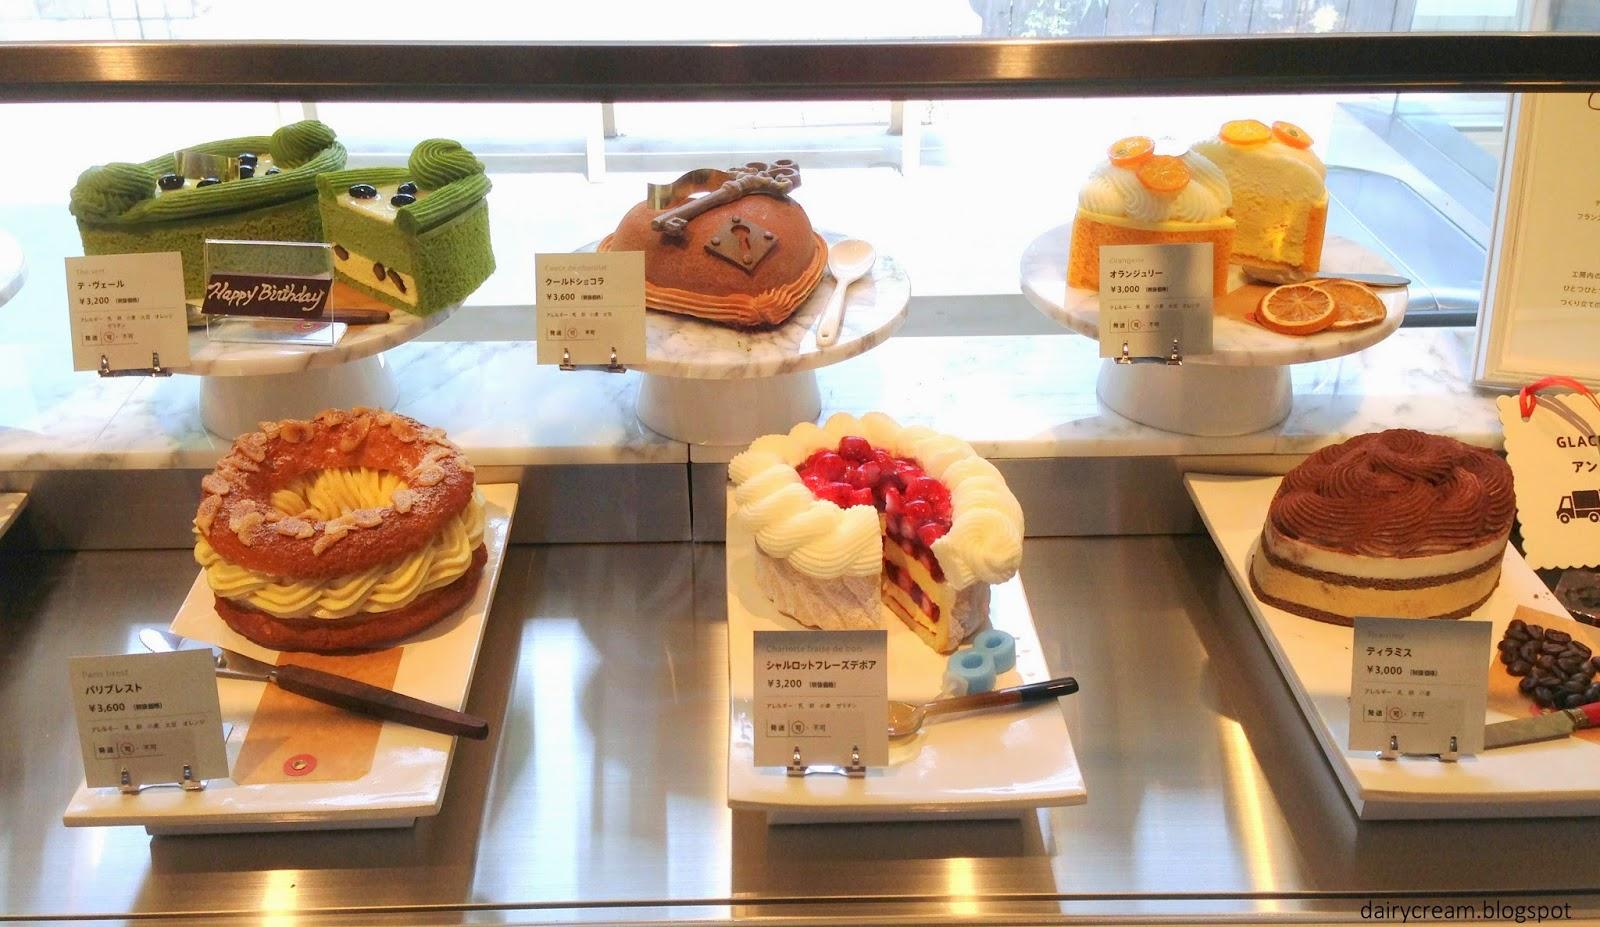 Verbena Fruit Cake Price